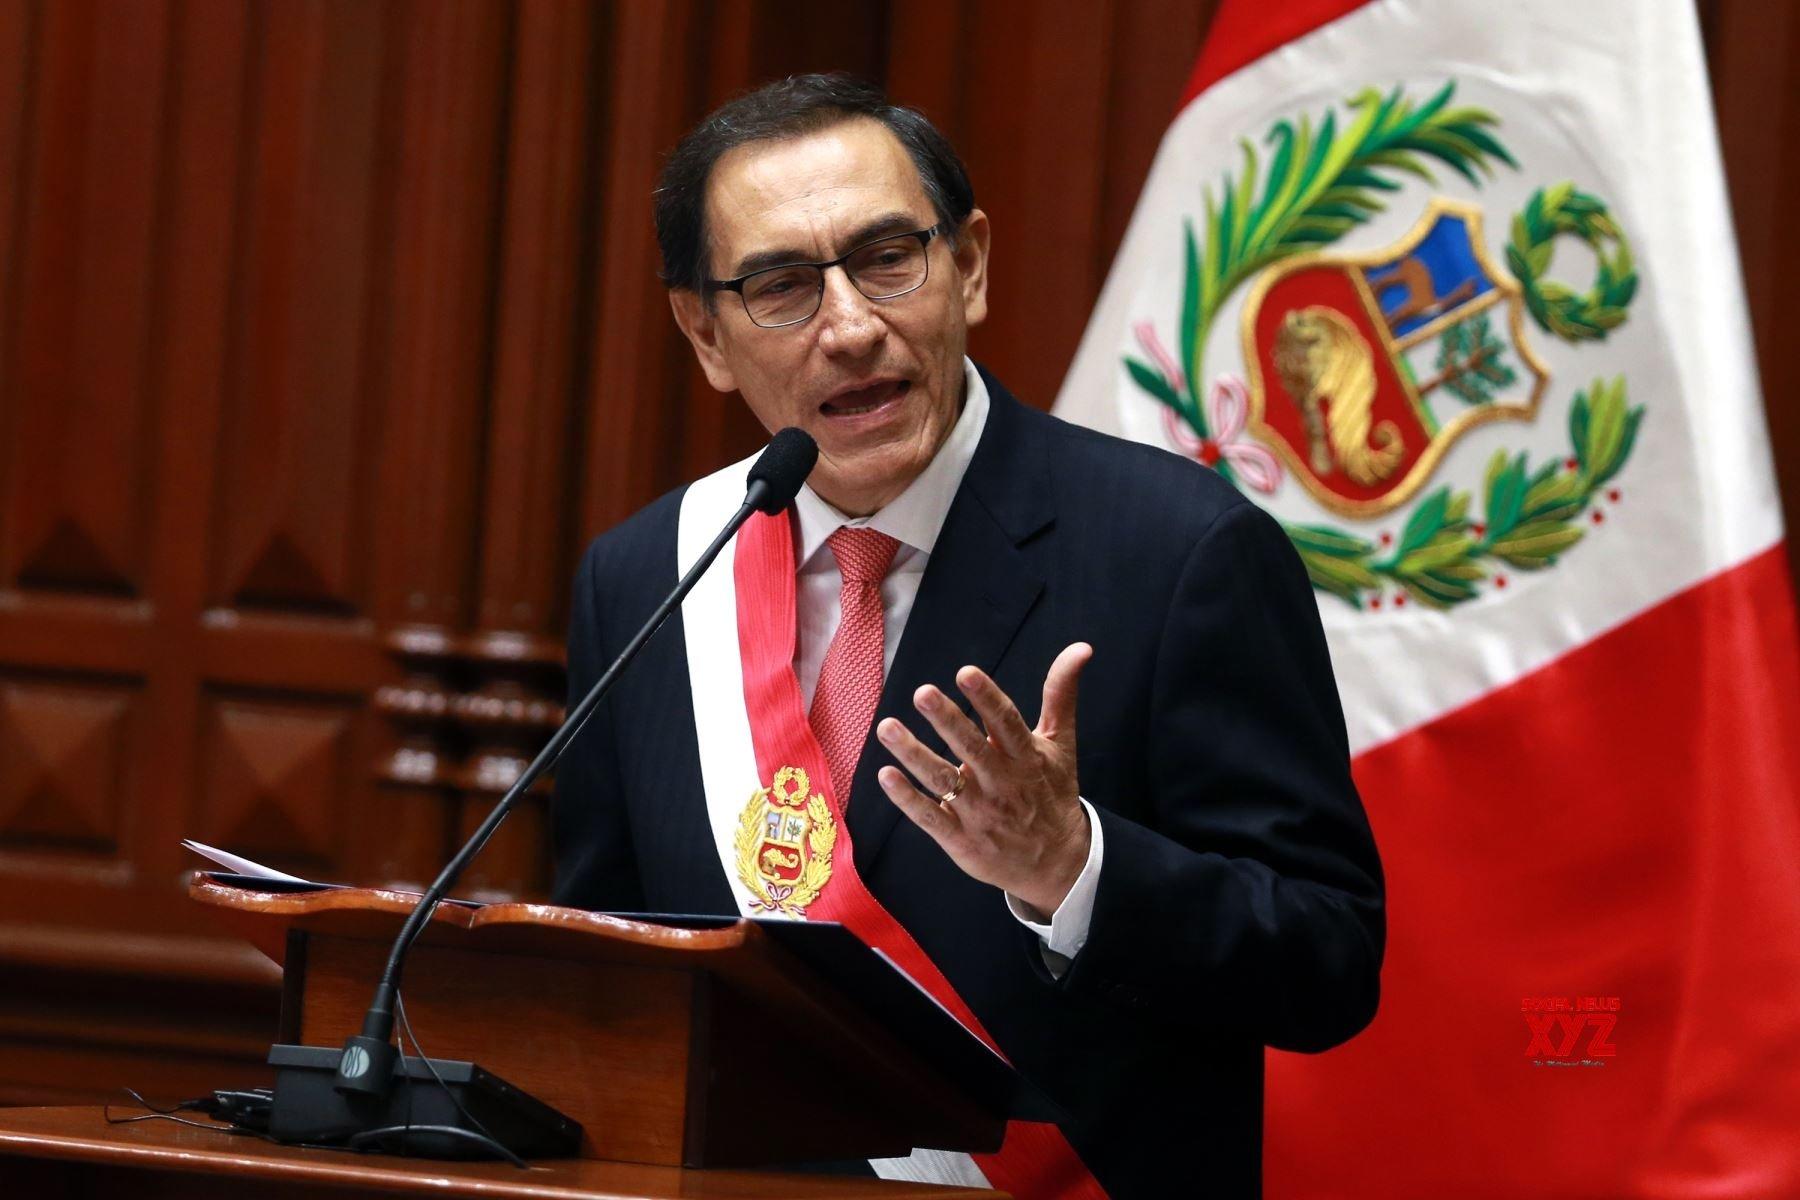 COVID-19: Peru free to restart football, says president